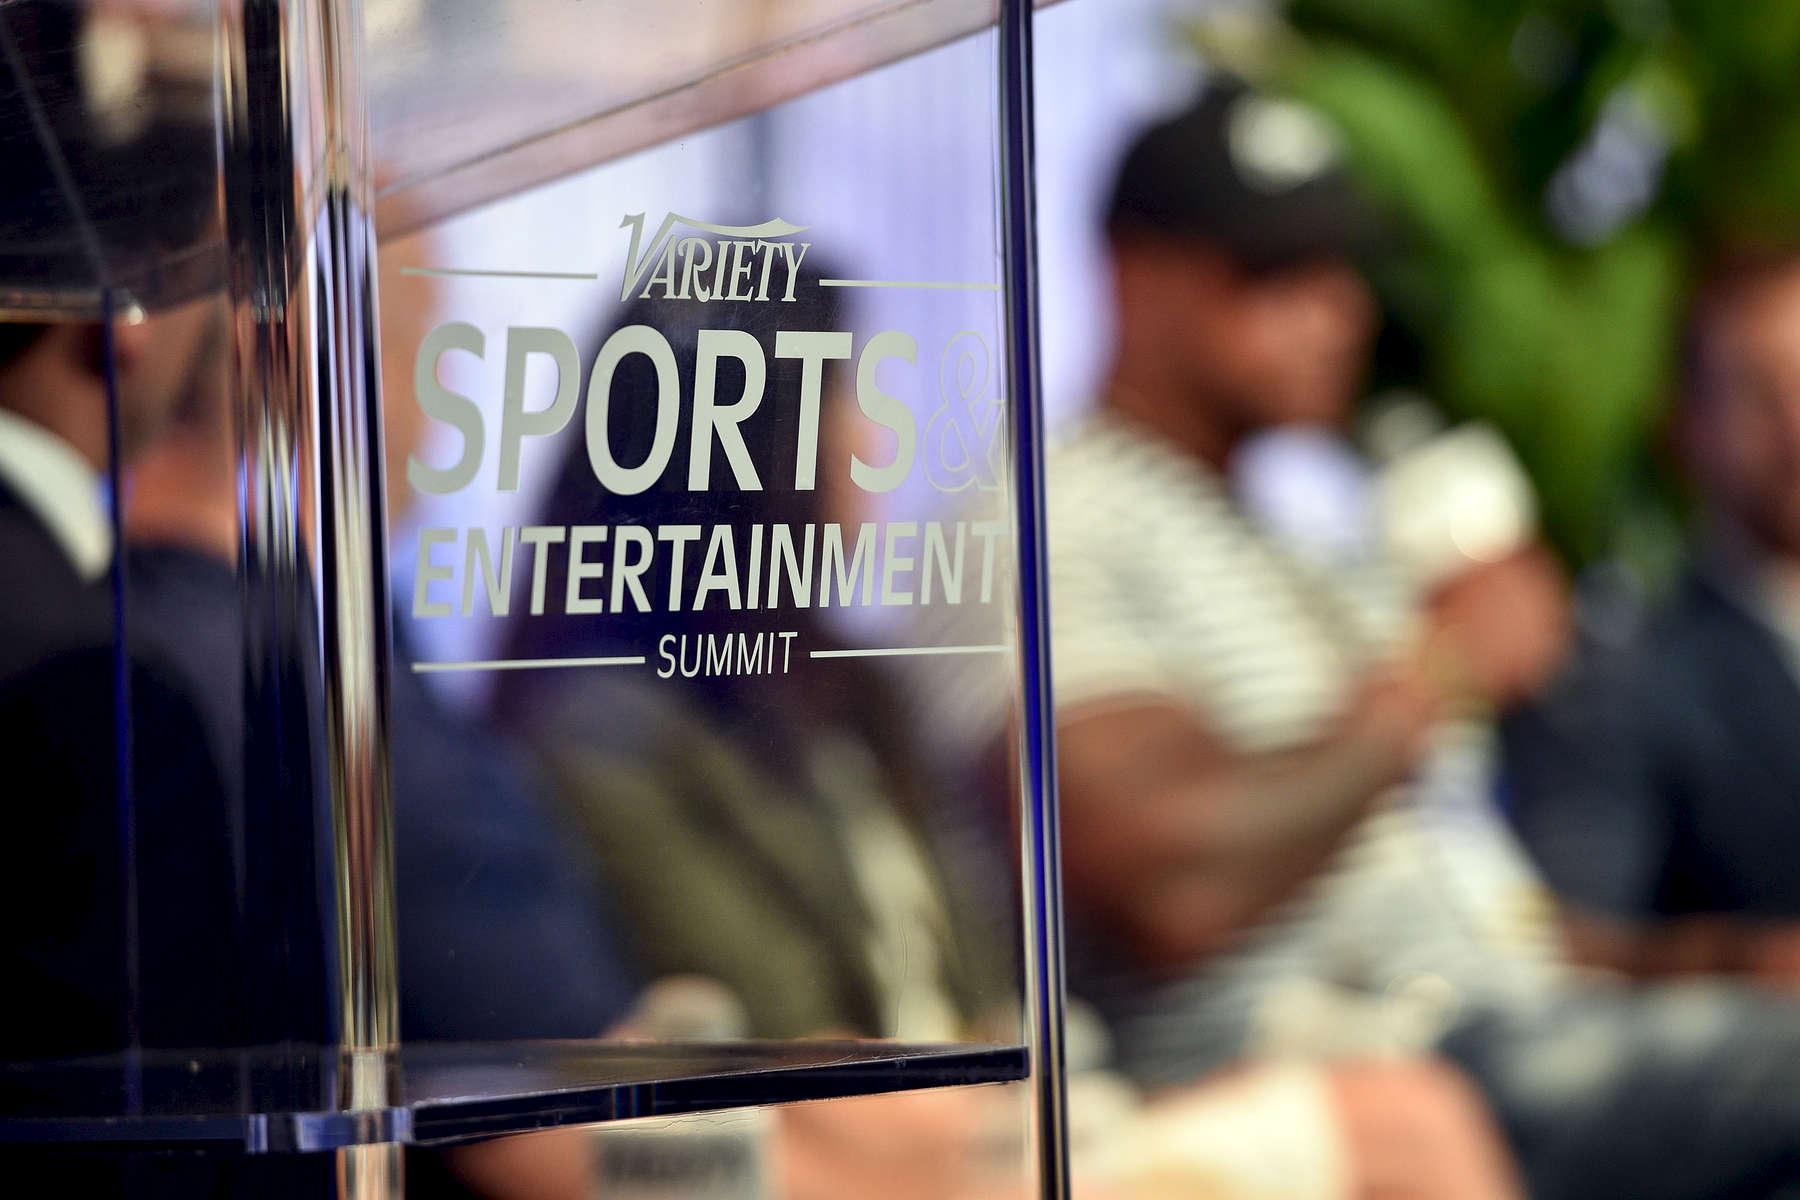 Mandatory Credit: Photo by Stewart Cook/Variety/REX/Shutterstock (8960146iq)AtmosphereVariety Sports Entertainment Summit, Los Angeles, USA - 13 Jul 2017